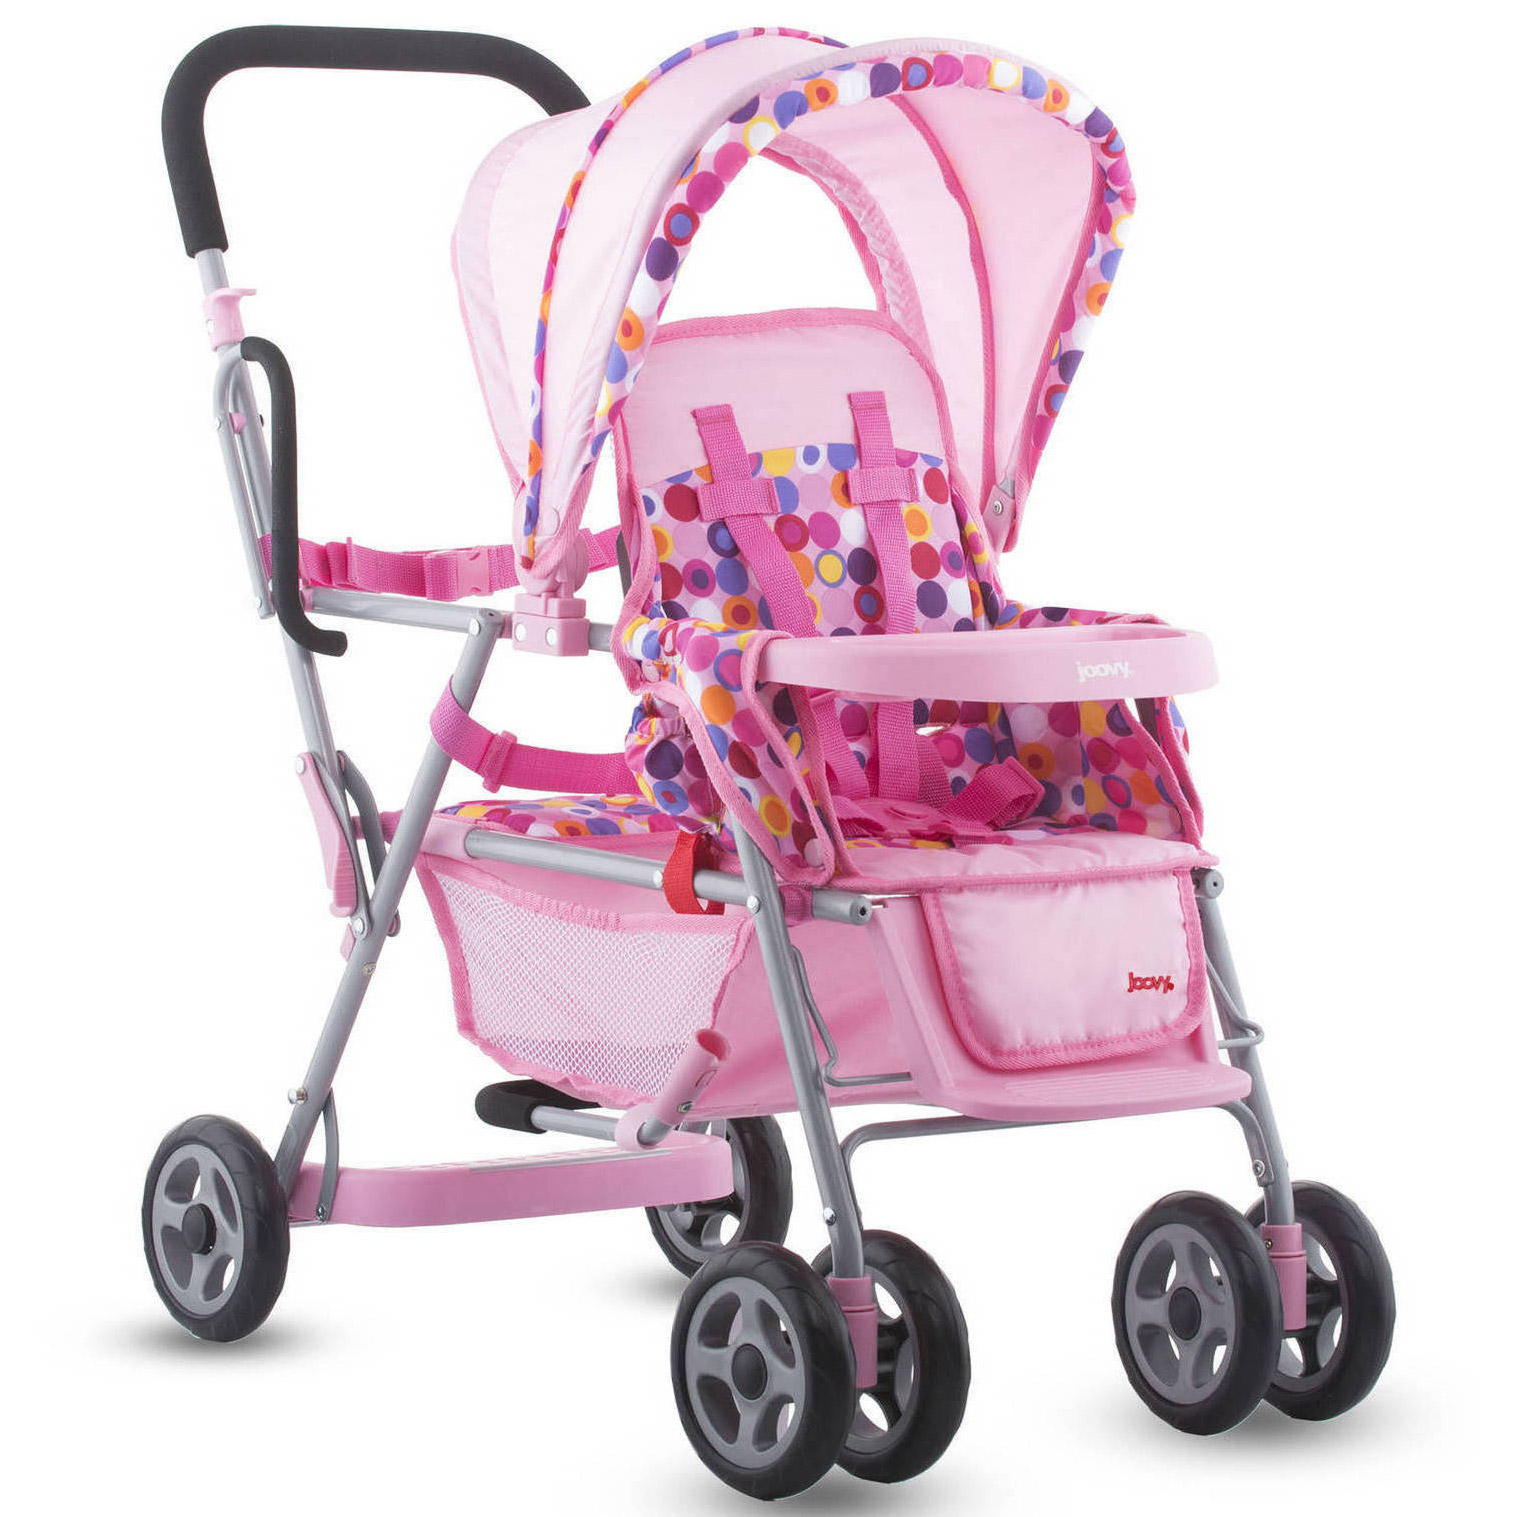 Joovy Caboose Toy Stroller Baby Doll Stroller, Pink